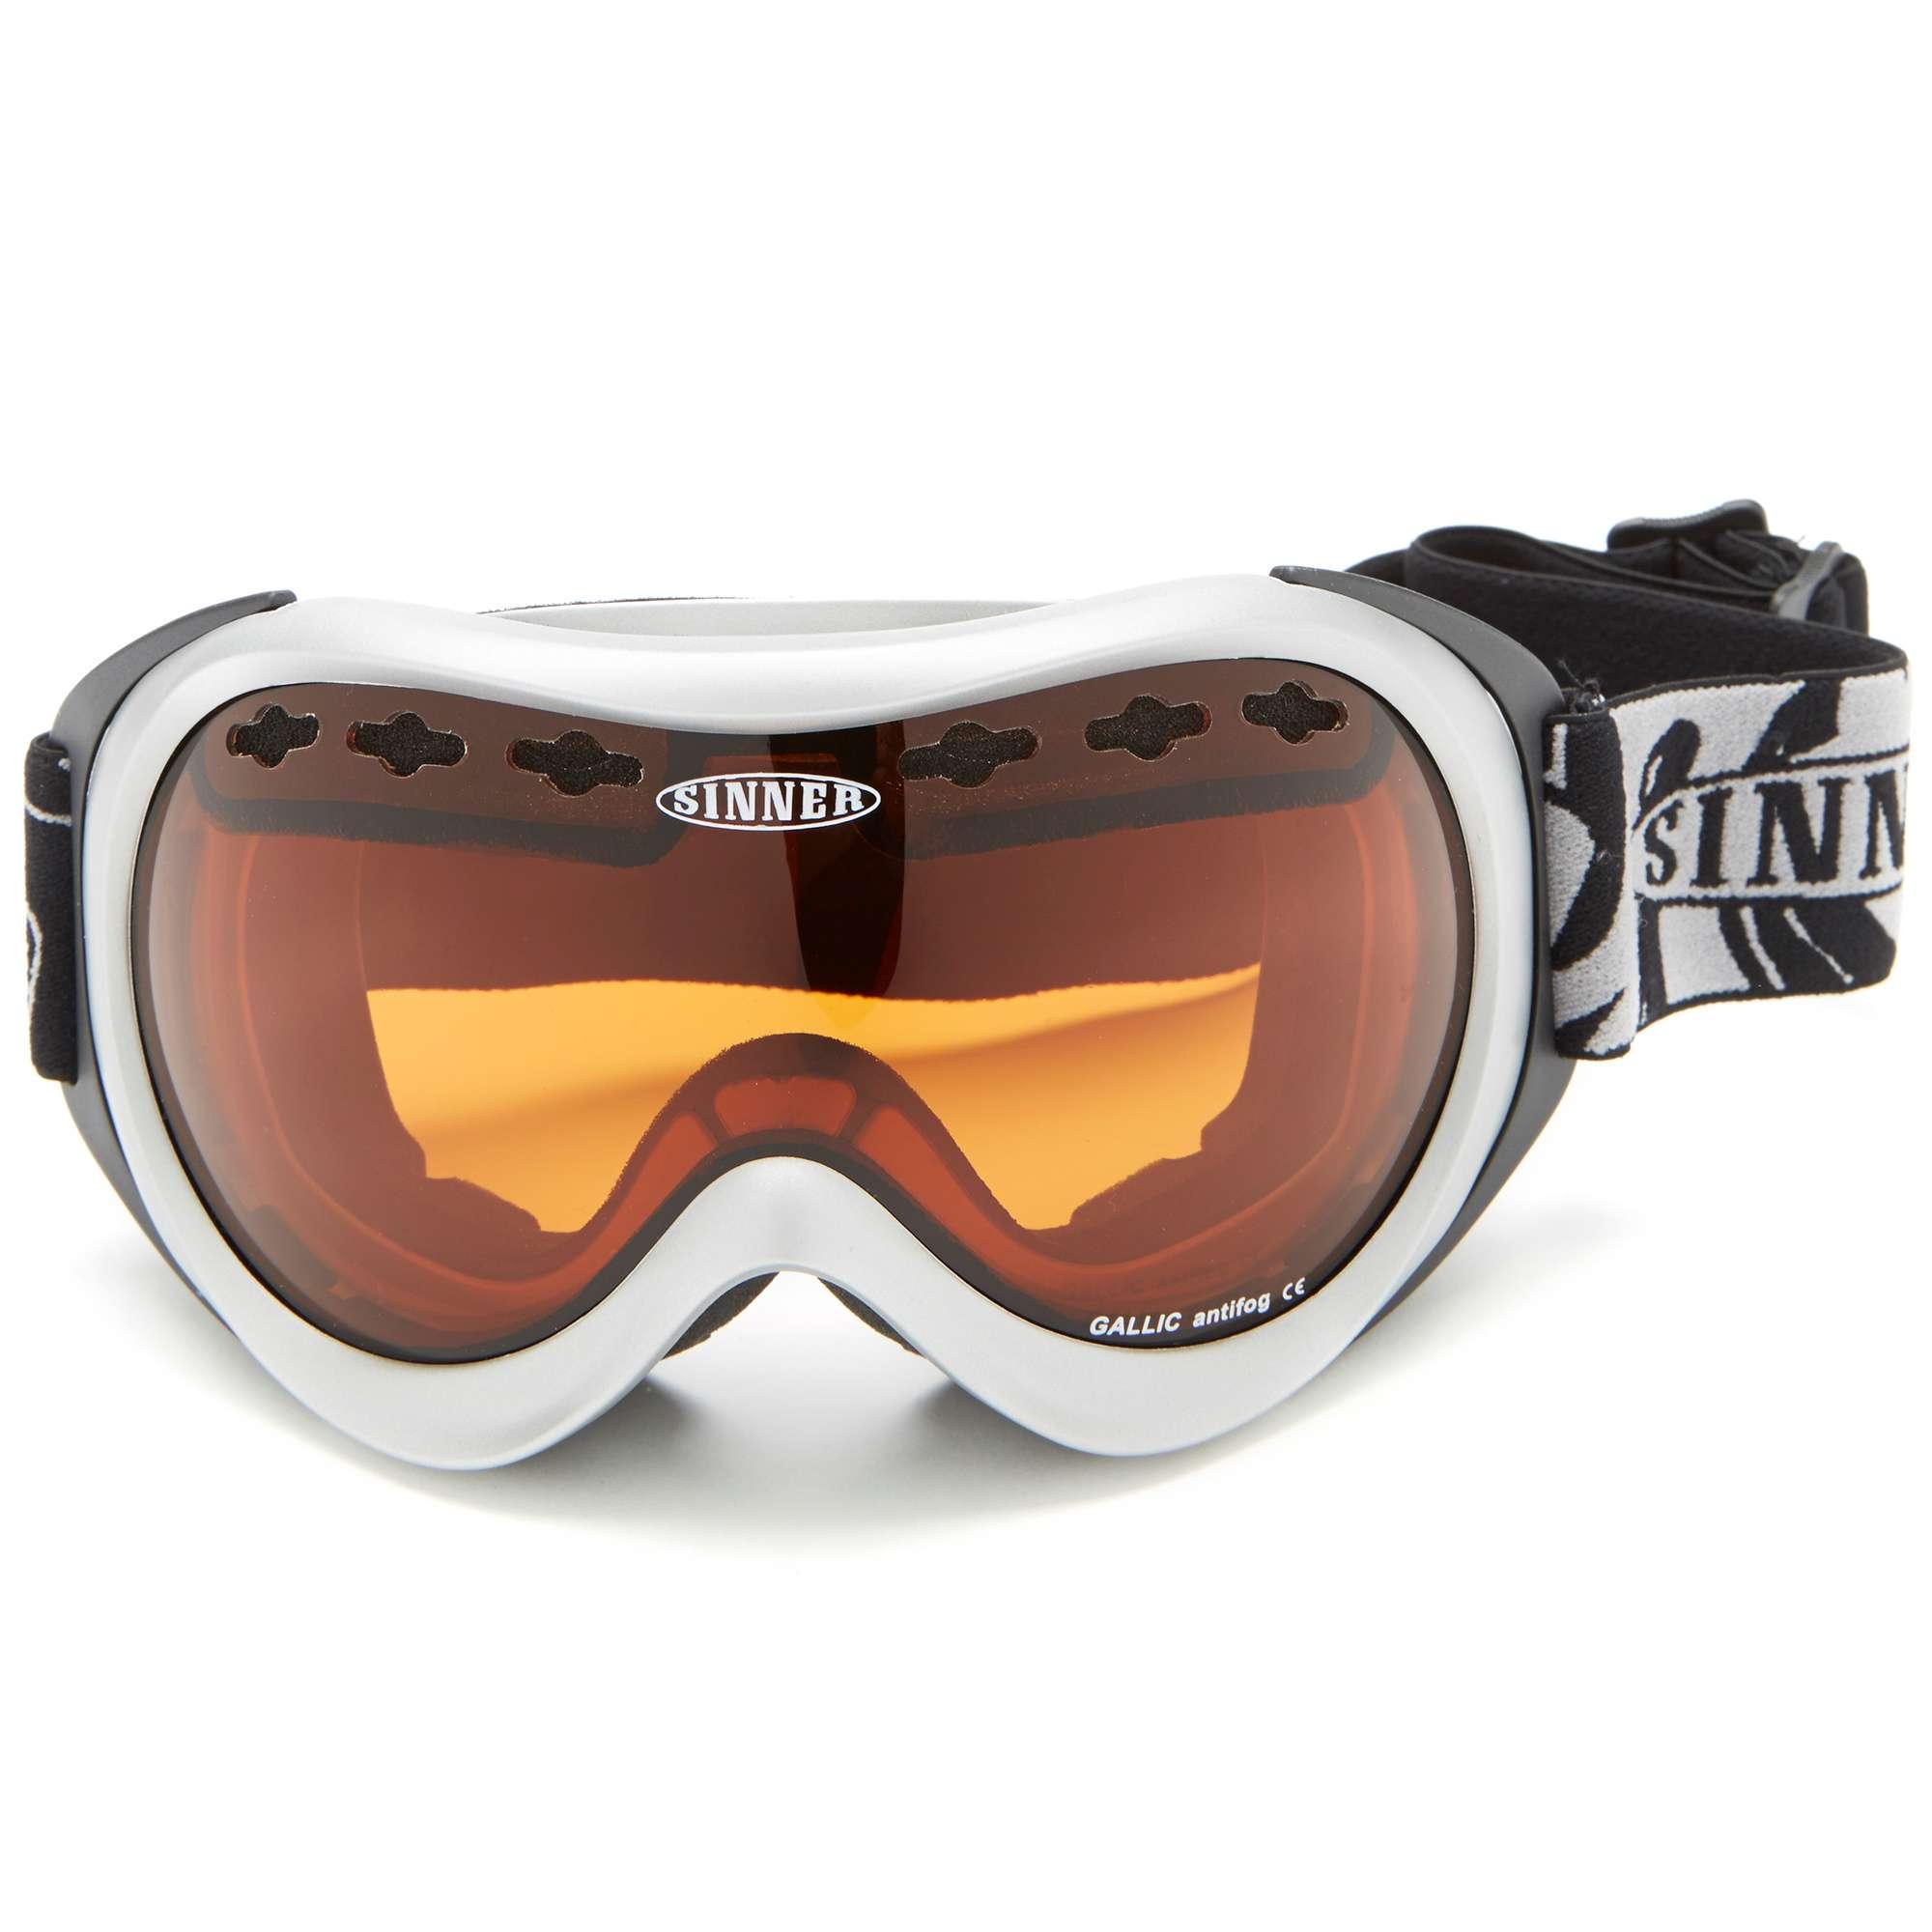 SINNER Gallic Ski Goggles